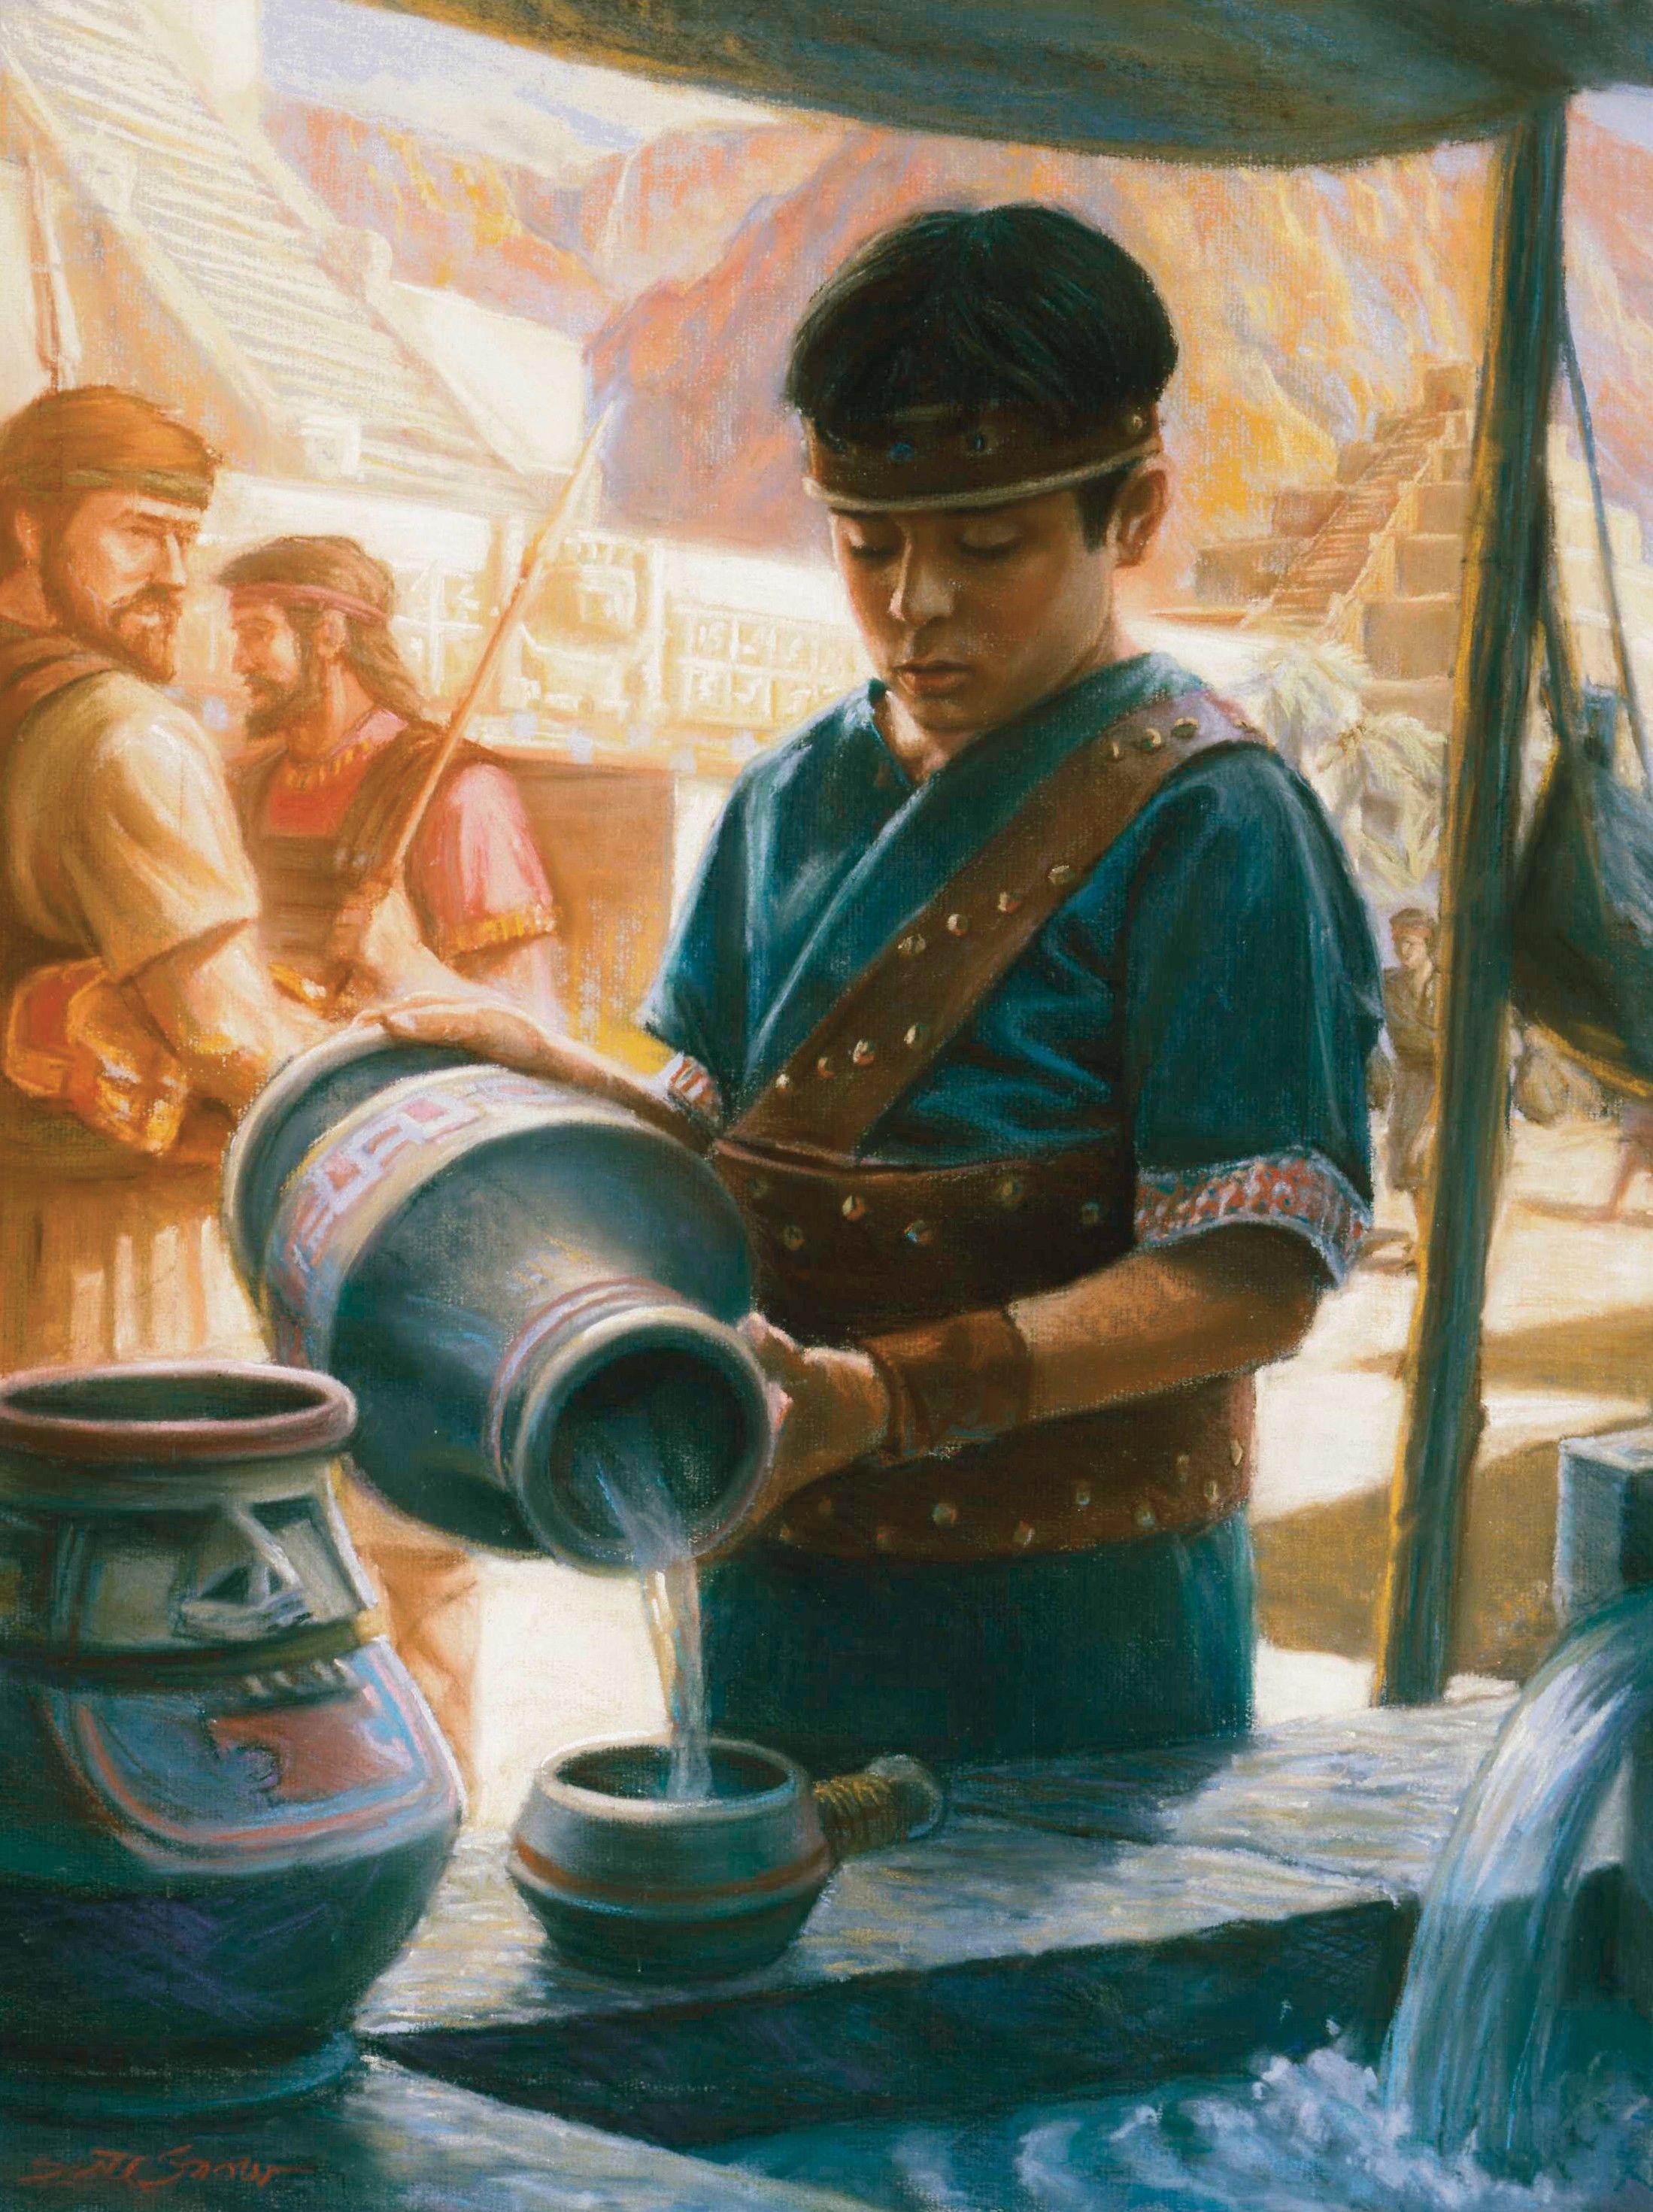 Mormon, Age 10, by Scott M. Snow